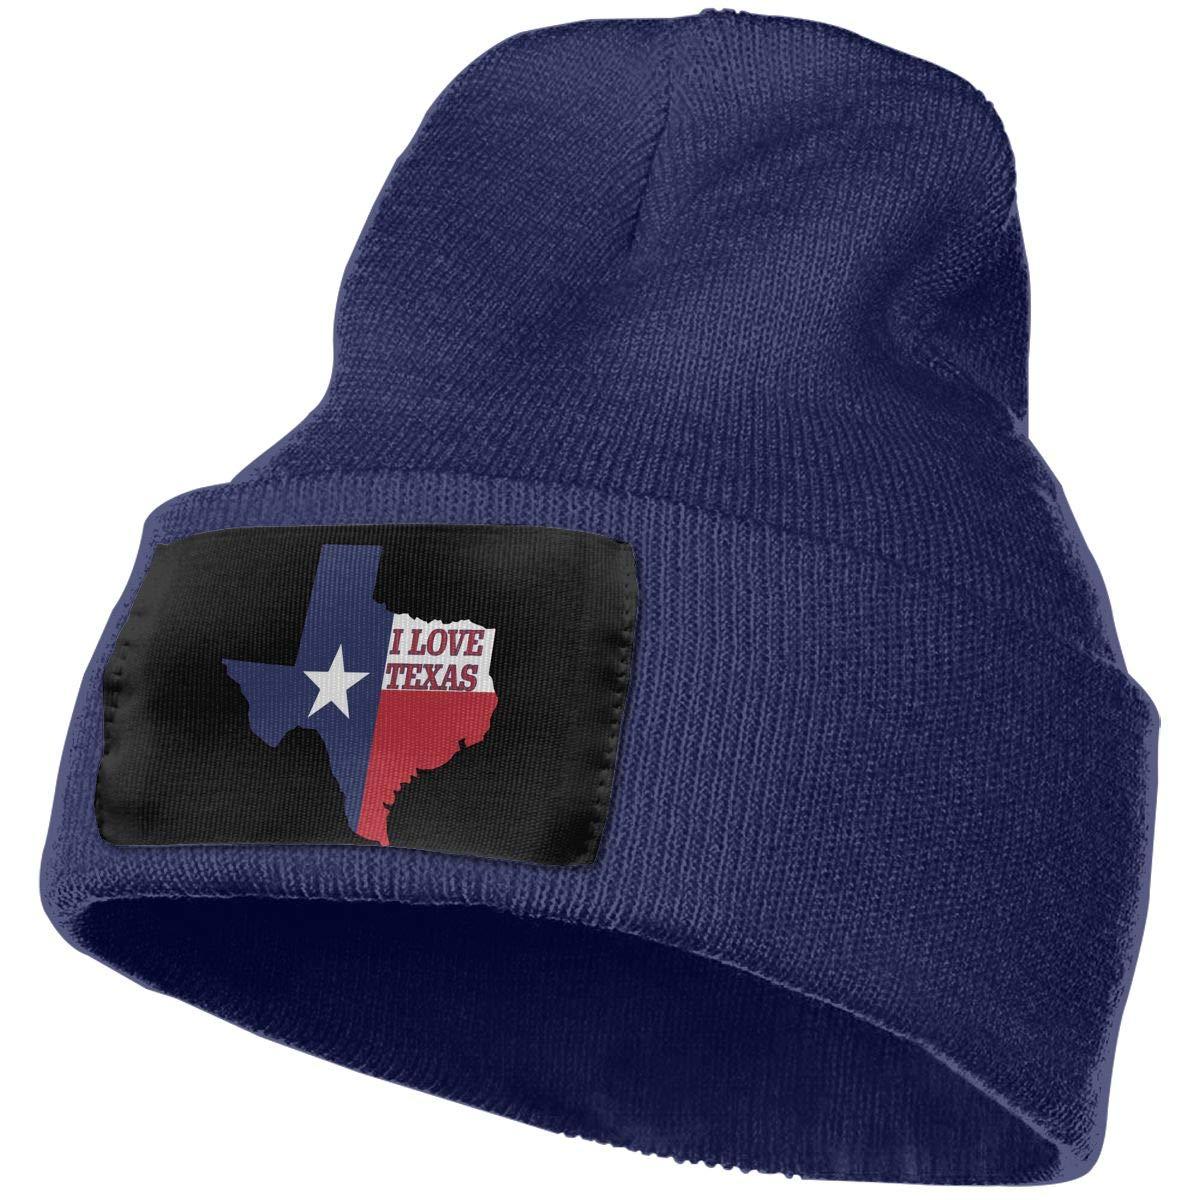 I Love Texas Texan Flag Thick Ski Cap Unisex 100/% Acrylic Knit Hat Cap